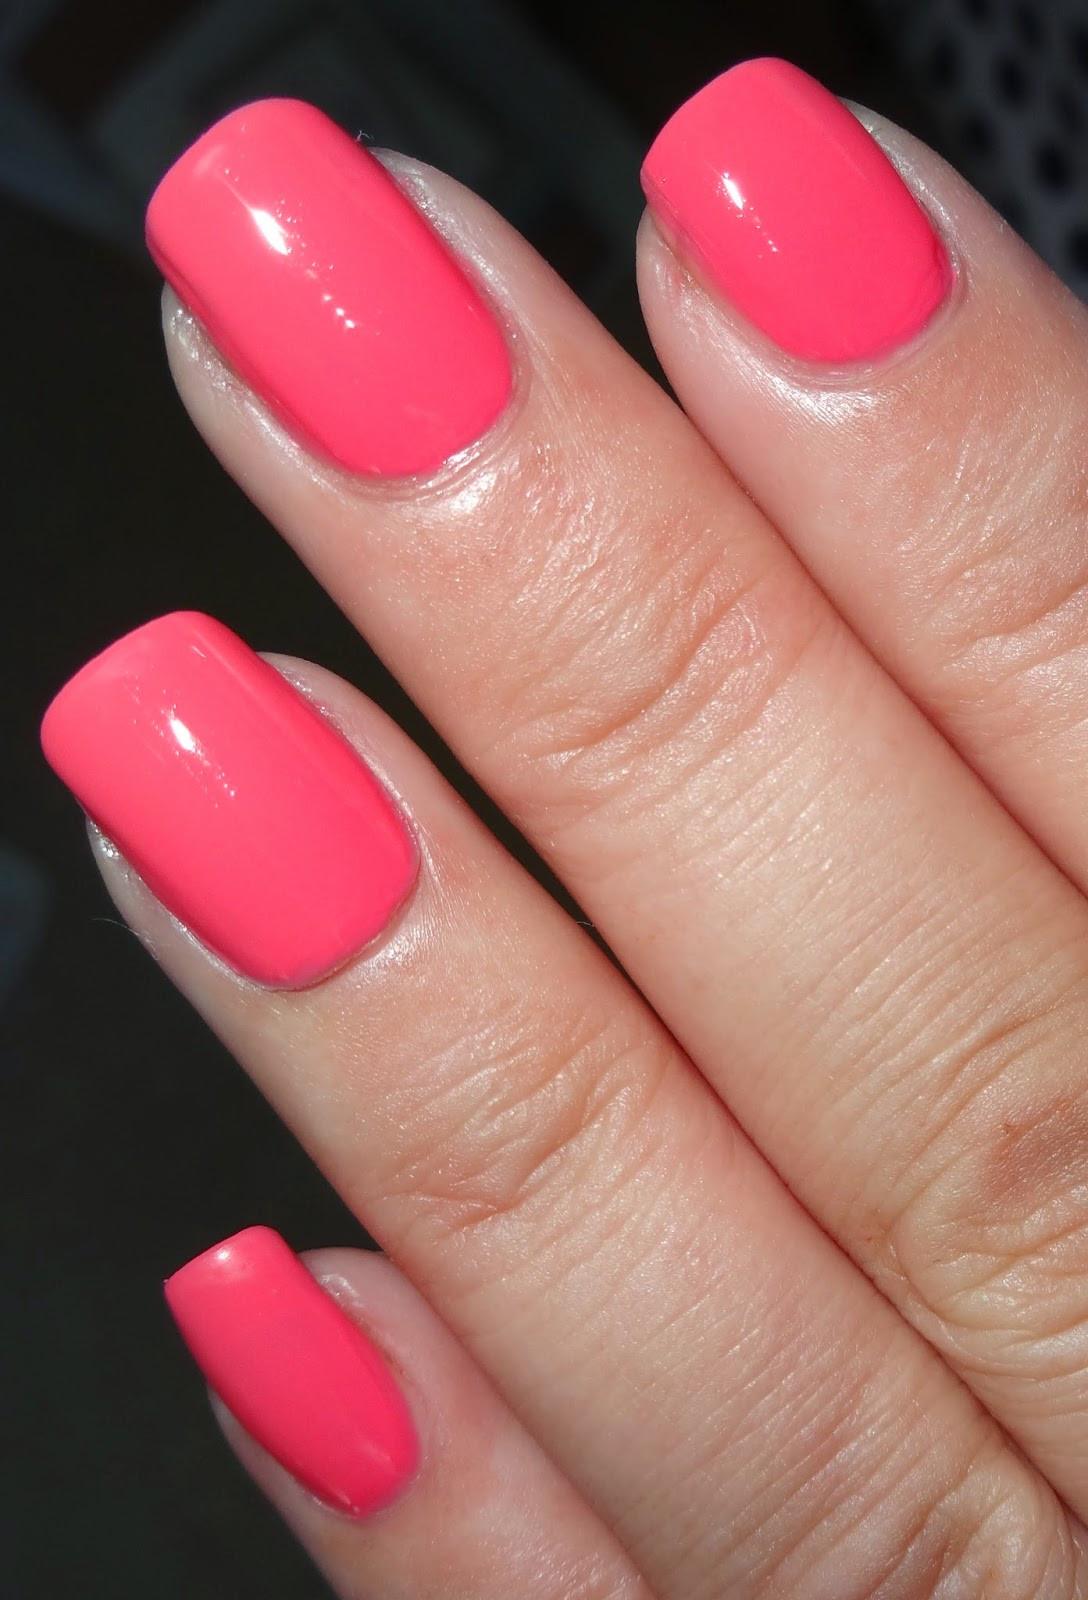 Pink Nail Colors  Wendy s Delights Beauty UK Nail Polish The Pinks Lady